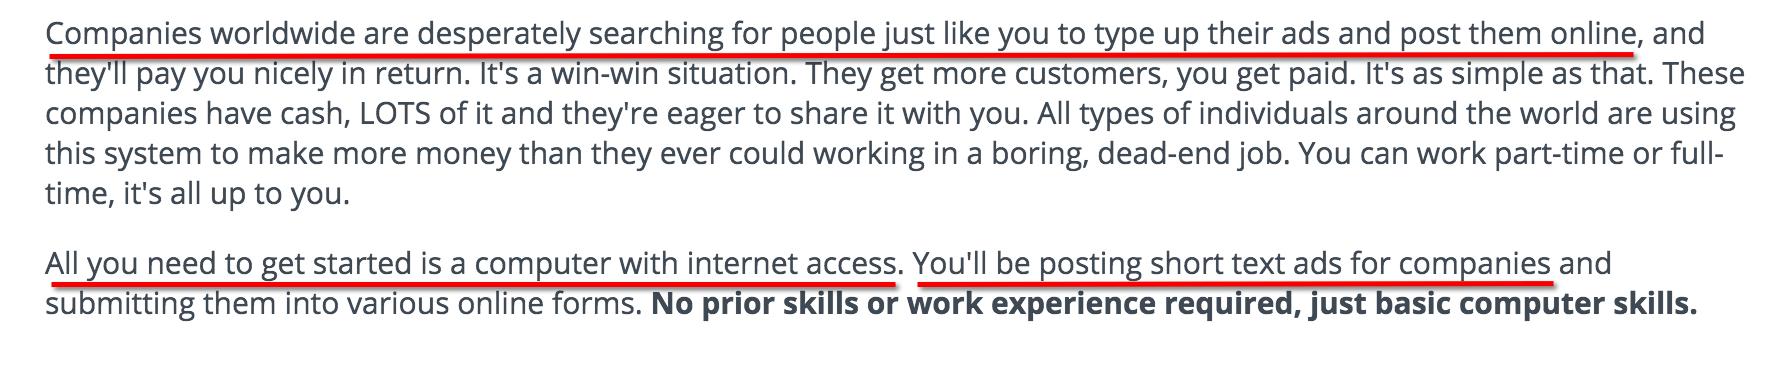 companies-are-desperate